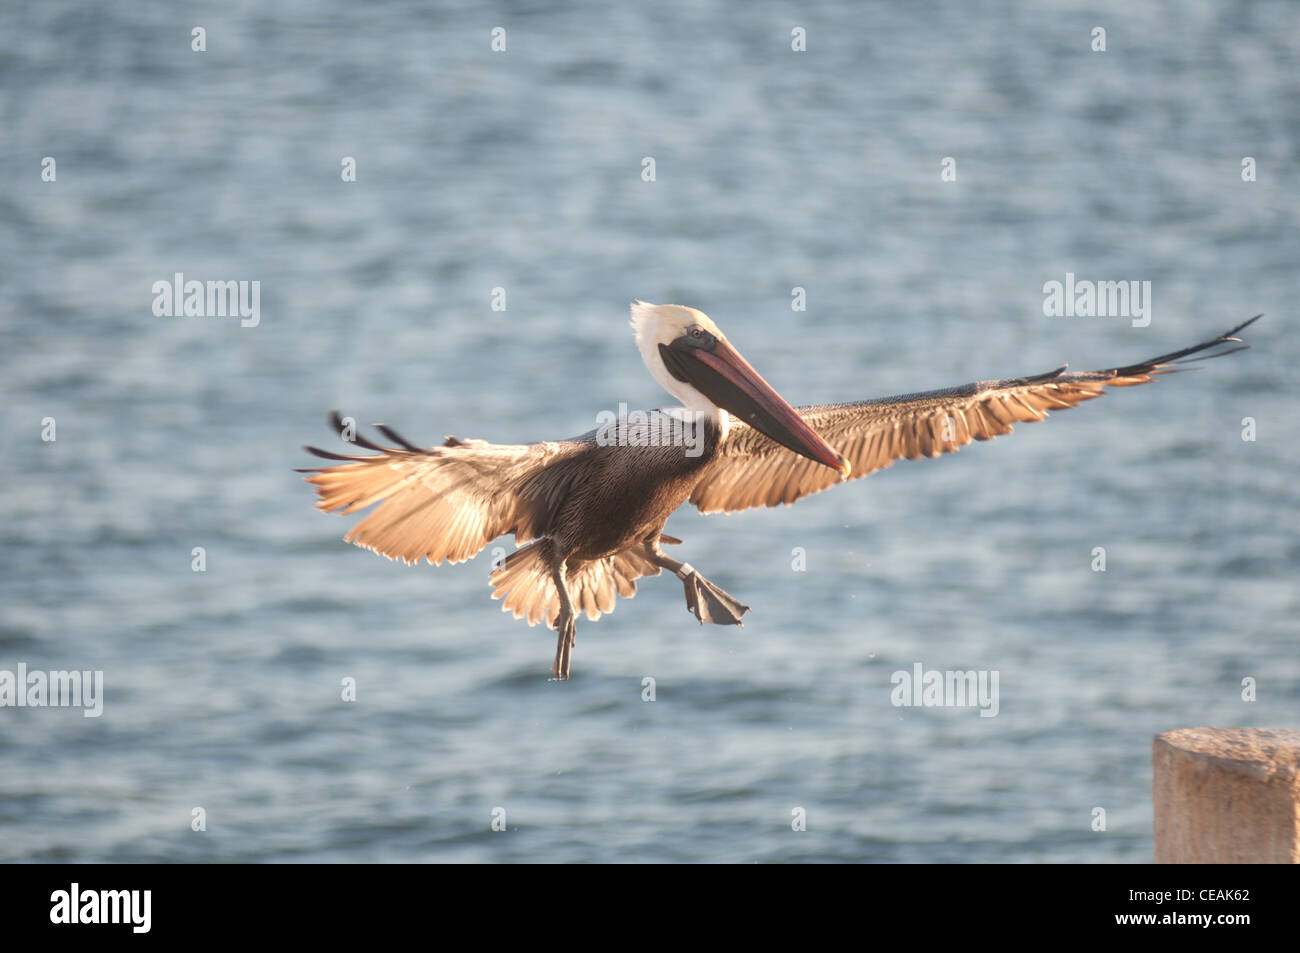 Brown Pelican, Pelecanus occidentalis, volare, Florida, Nord America, STATI UNITI D'AMERICA Immagini Stock